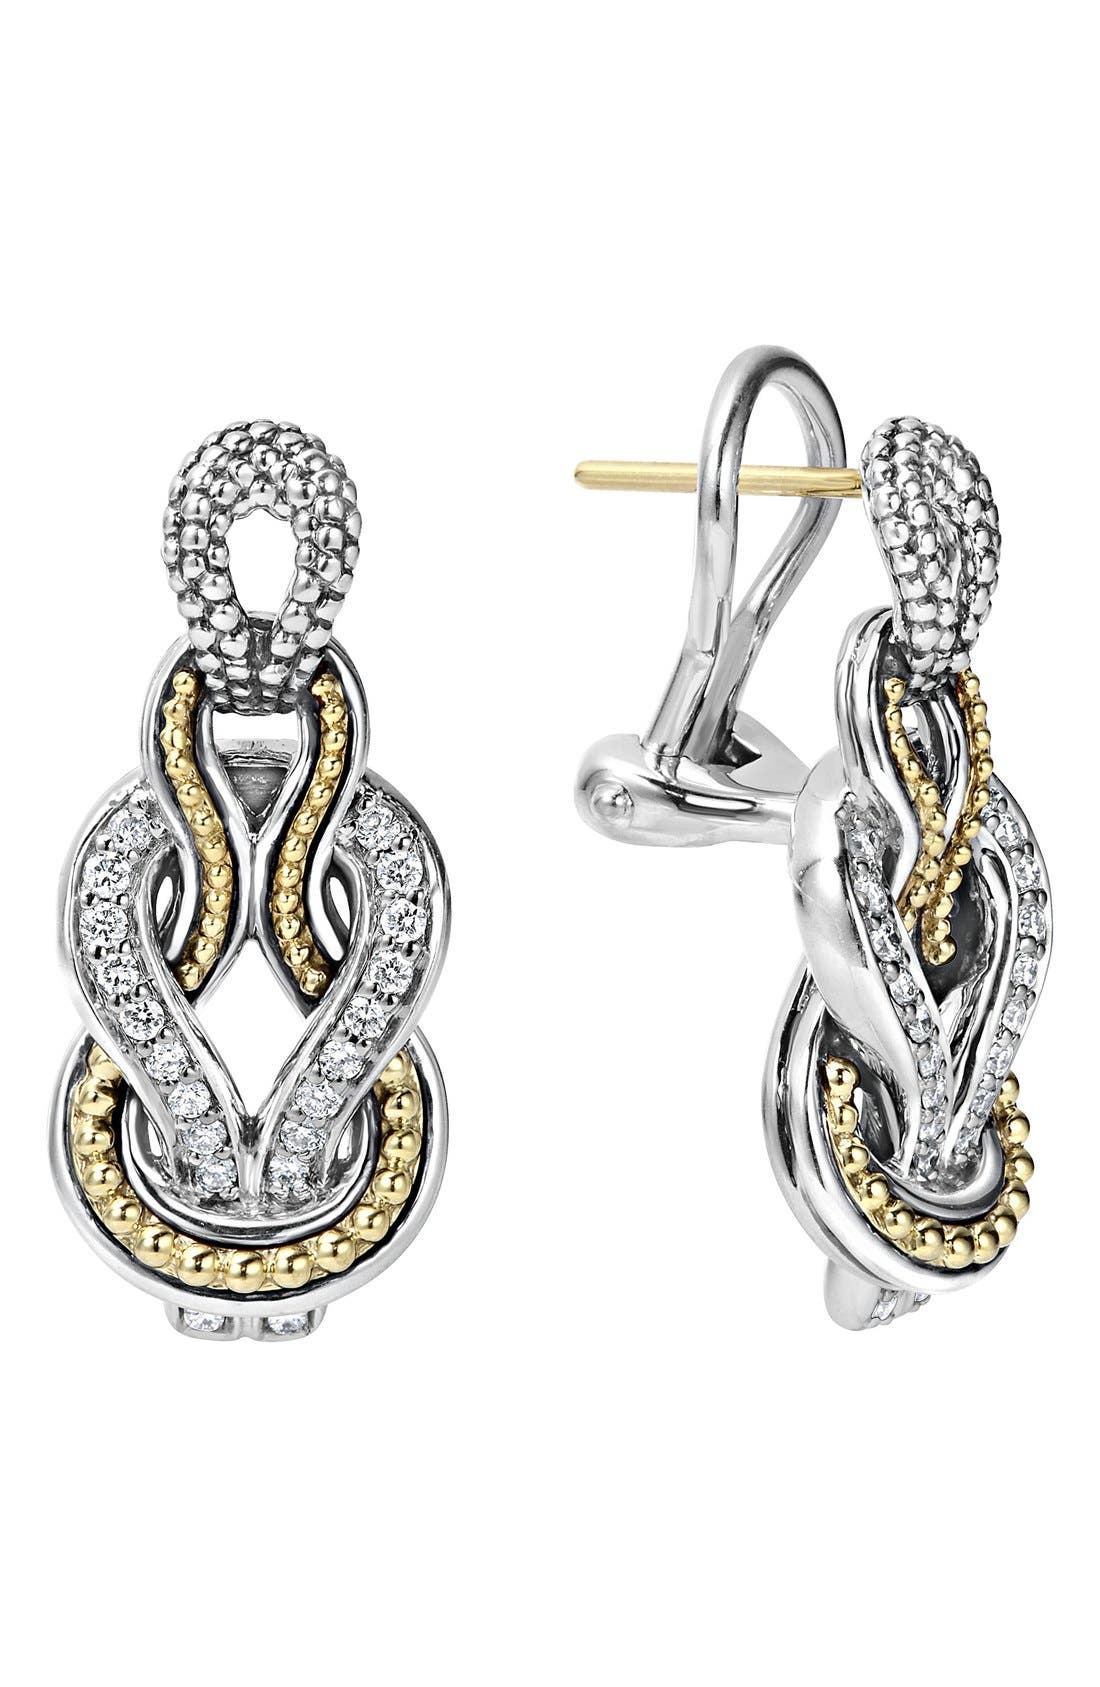 'Newport' Diamond Knot Earrings,                         Main,                         color, Silver/ Gold